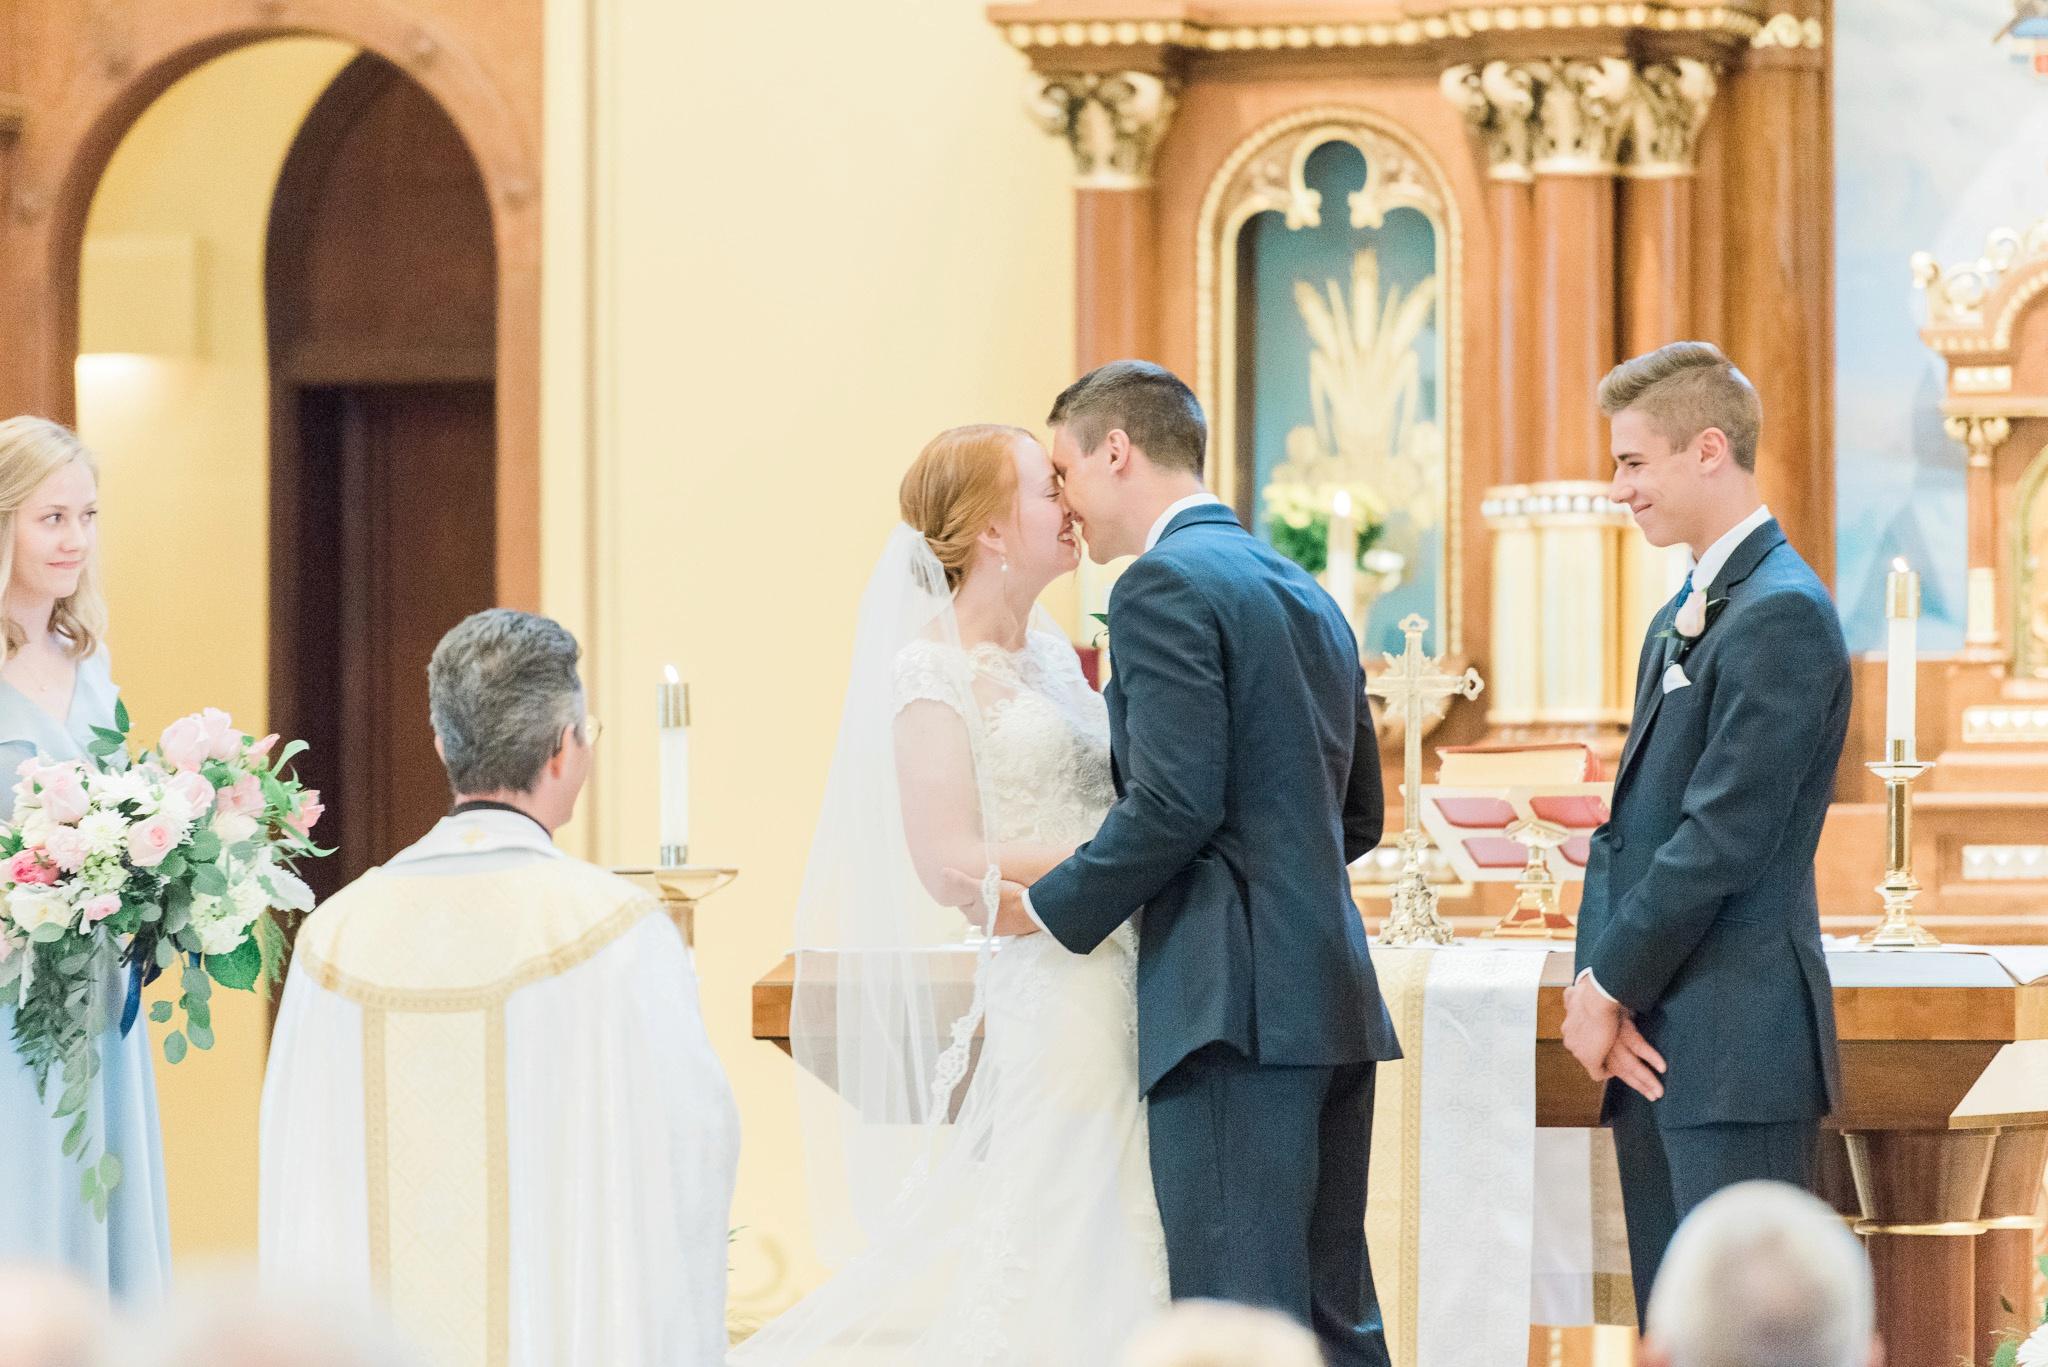 sunbury-ohio-wedding-hannah-johnathan_0028.jpg